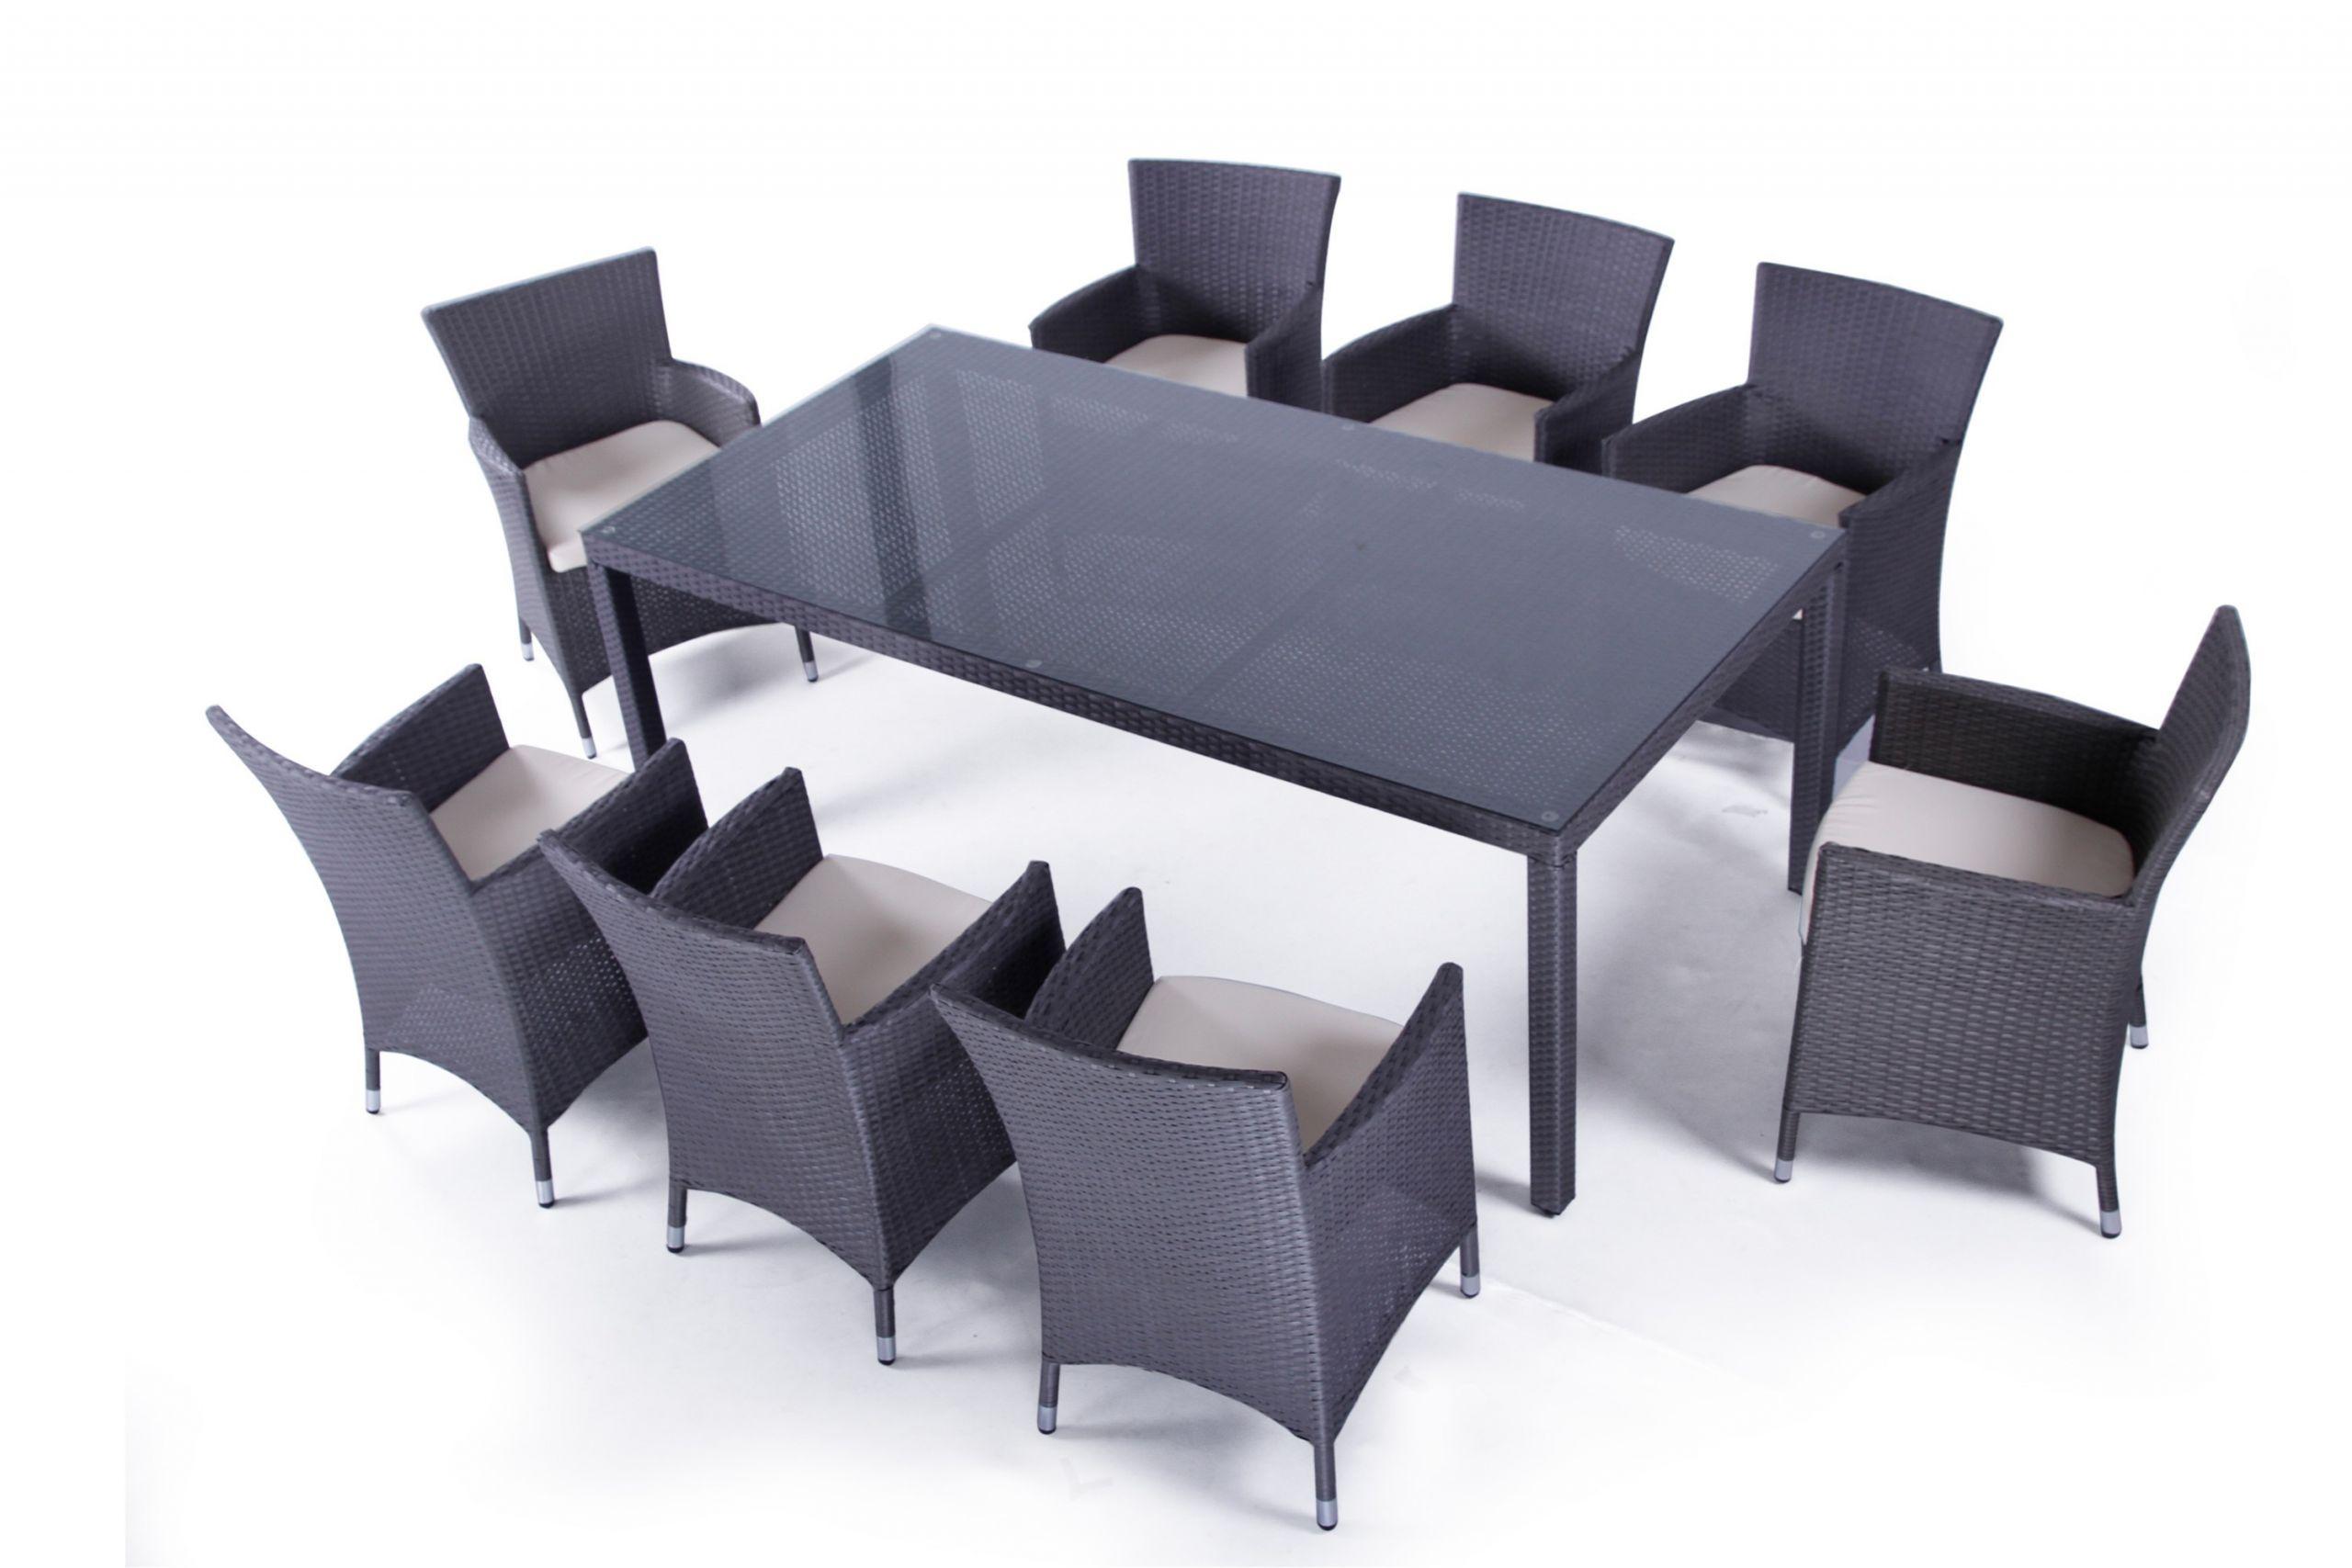 39 Best Of Tables Et Chaises De Jardin En Solde | Salon Jardin à Table Et Chaise De Jardin En Solde